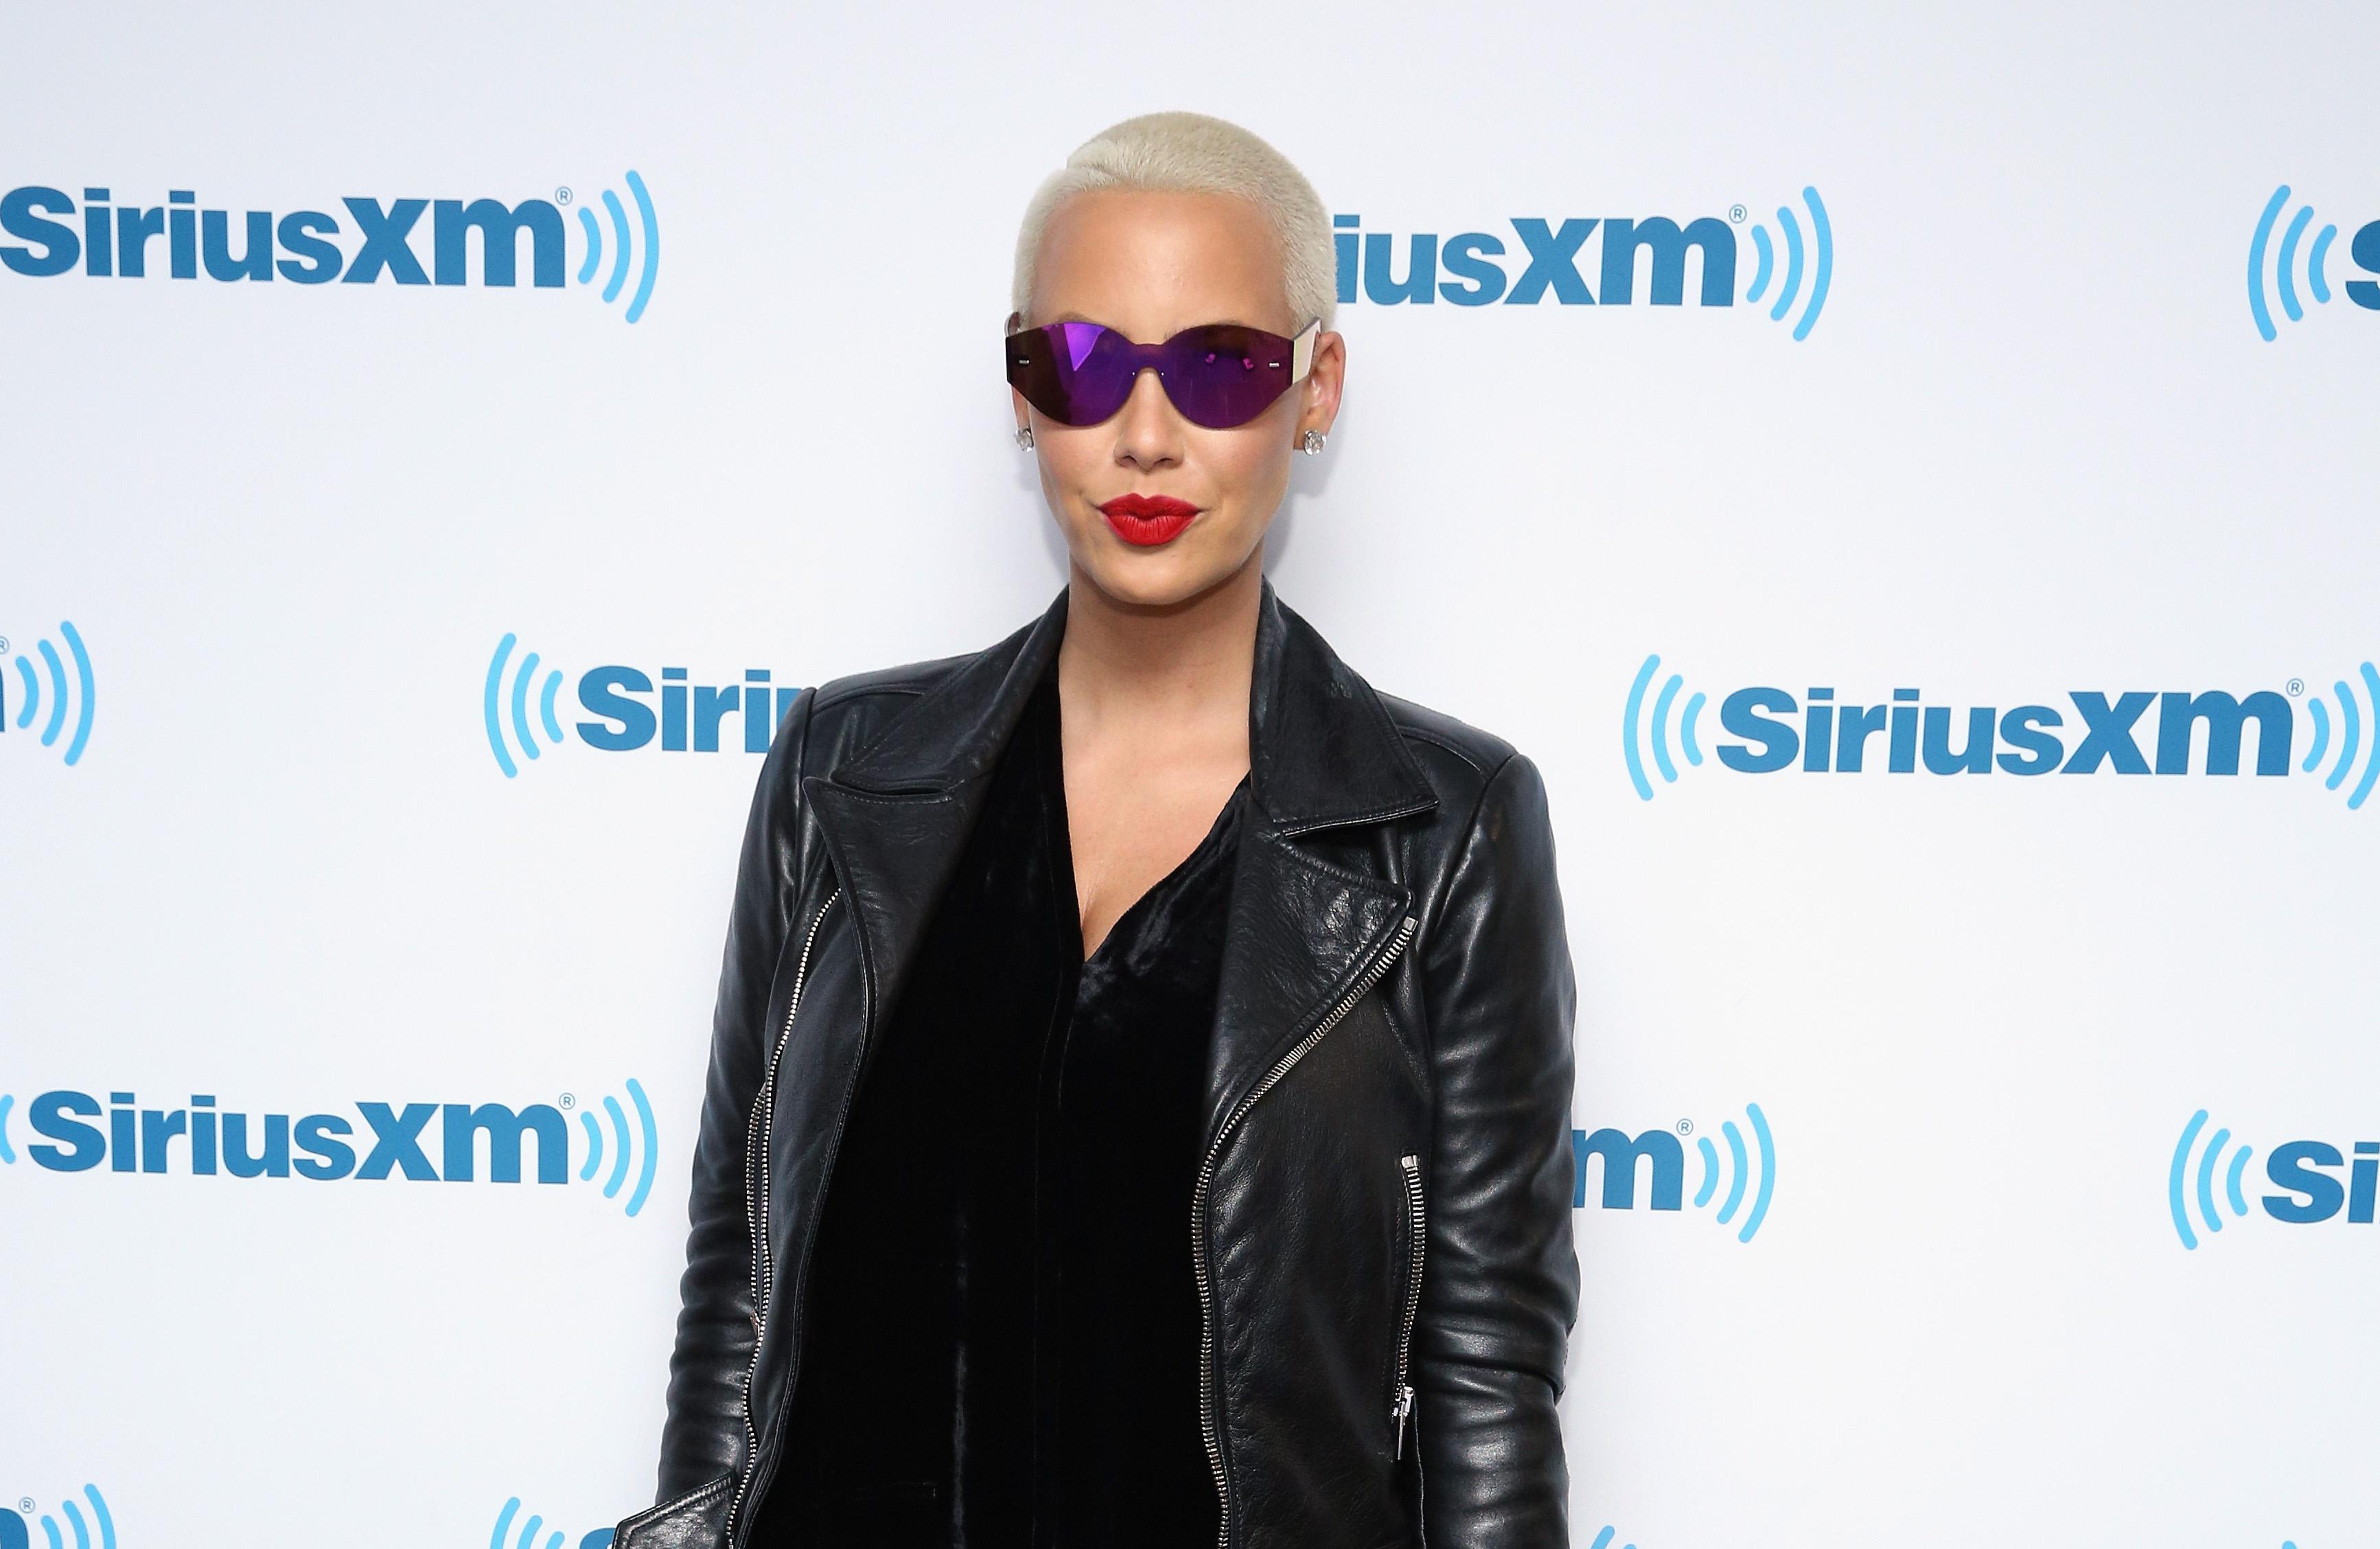 Amber Rose visits at SiriusXM Studio on June 17, 2016 in New York City.